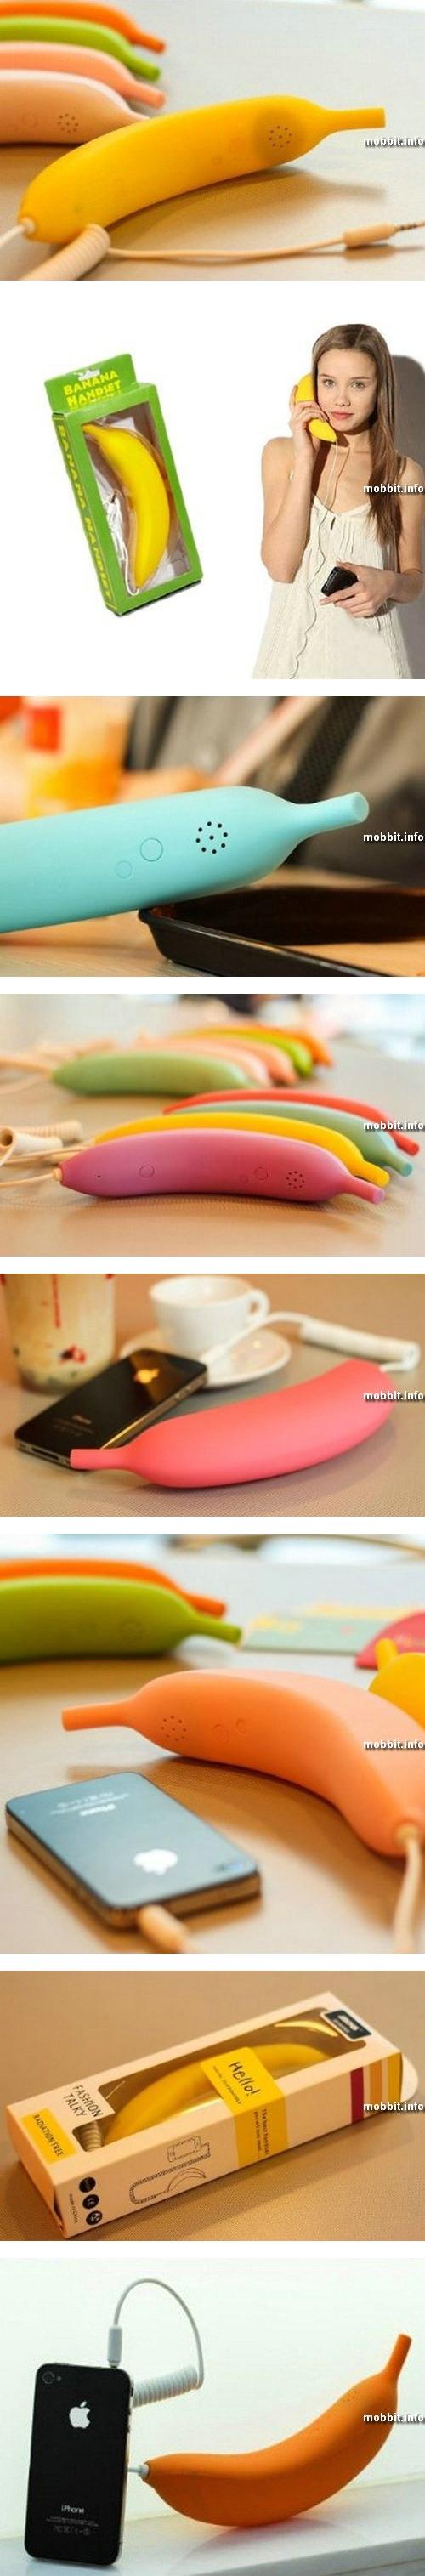 Banana Radiation-Proof Handset